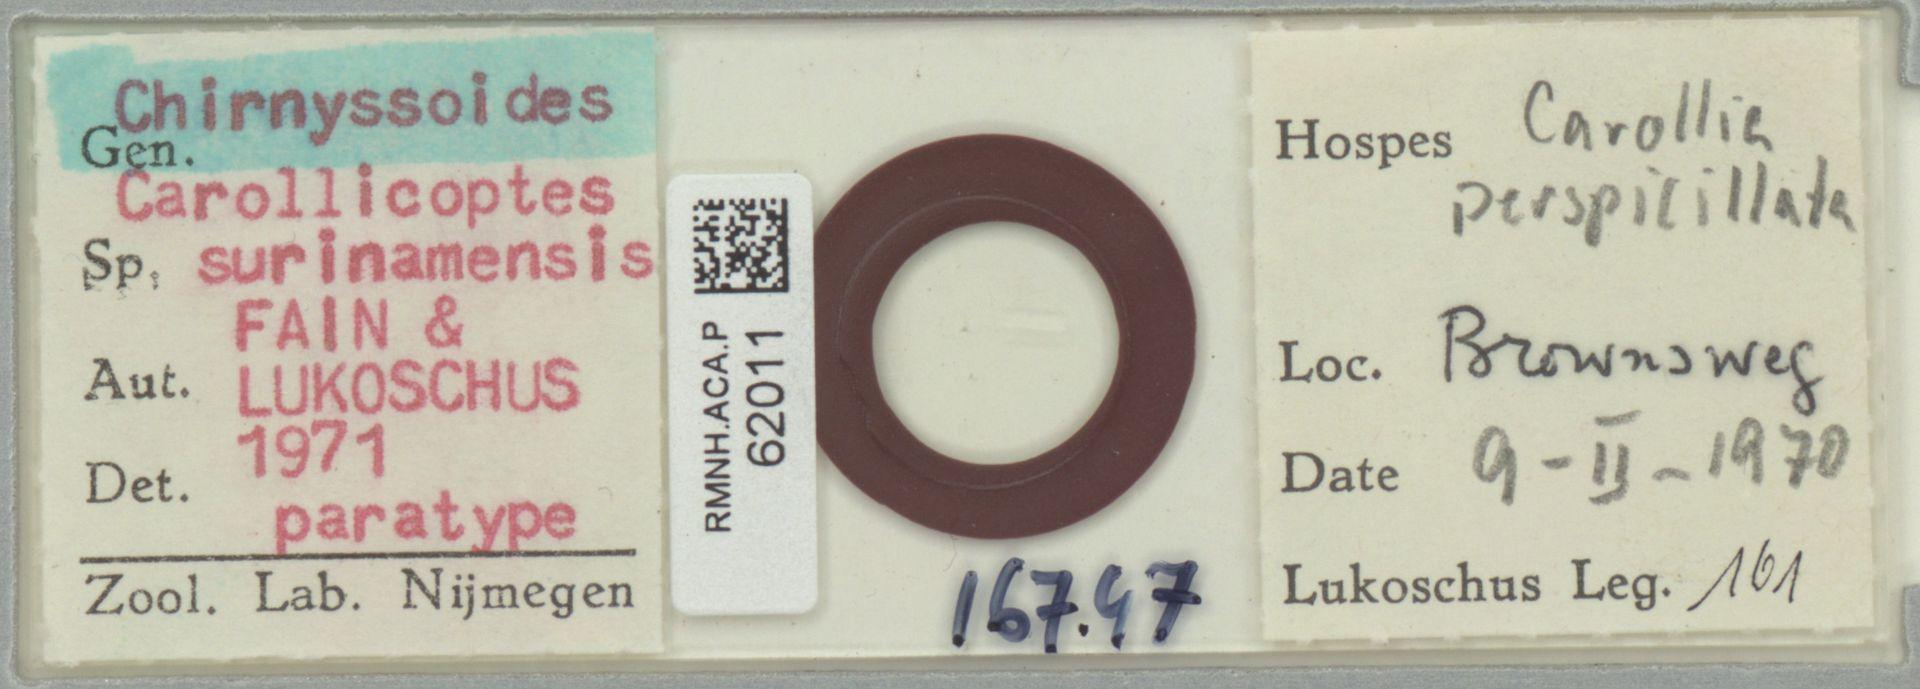 RMNH.ACA.P.62011   Chirnyssoides (Carrolicoptes) surinamensis Fain & Lukoschus 1971